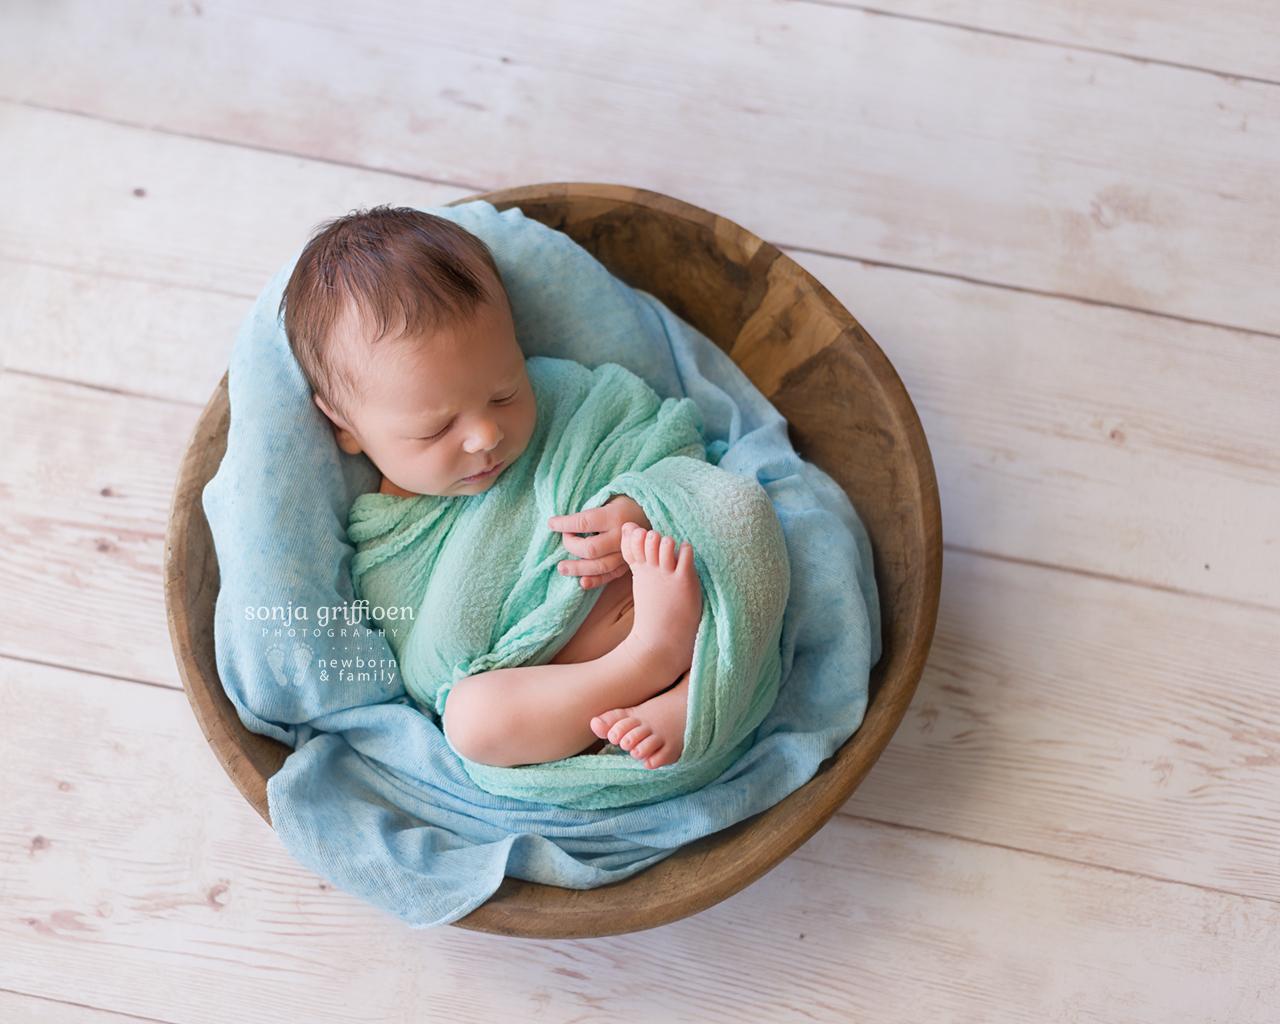 Marko-Newborn-Brisbane-Newborn-Photographer-Sonja-Griffioen-07.jpg